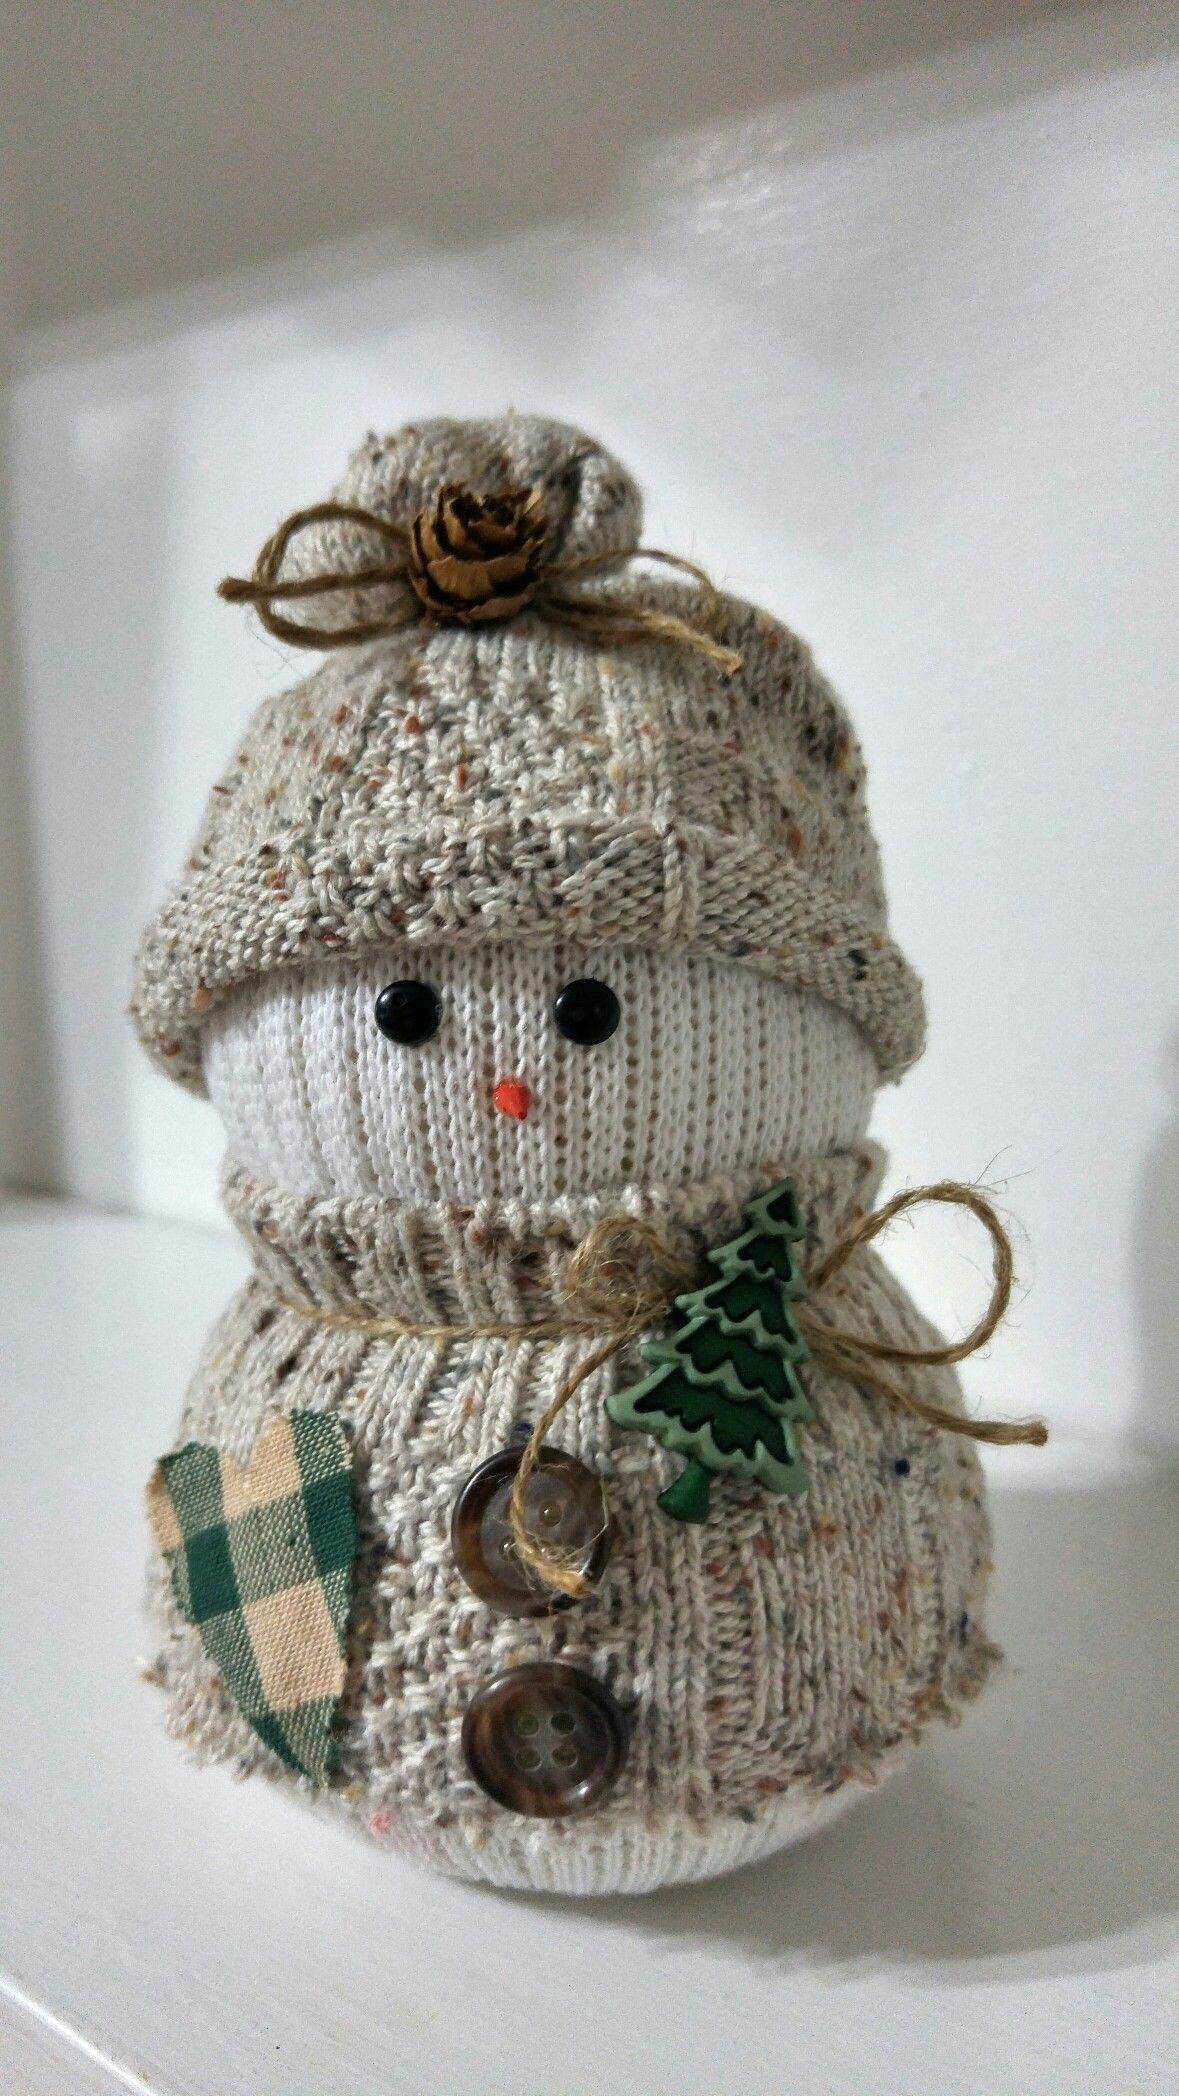 Cute sock snowman More Cute sock snowman